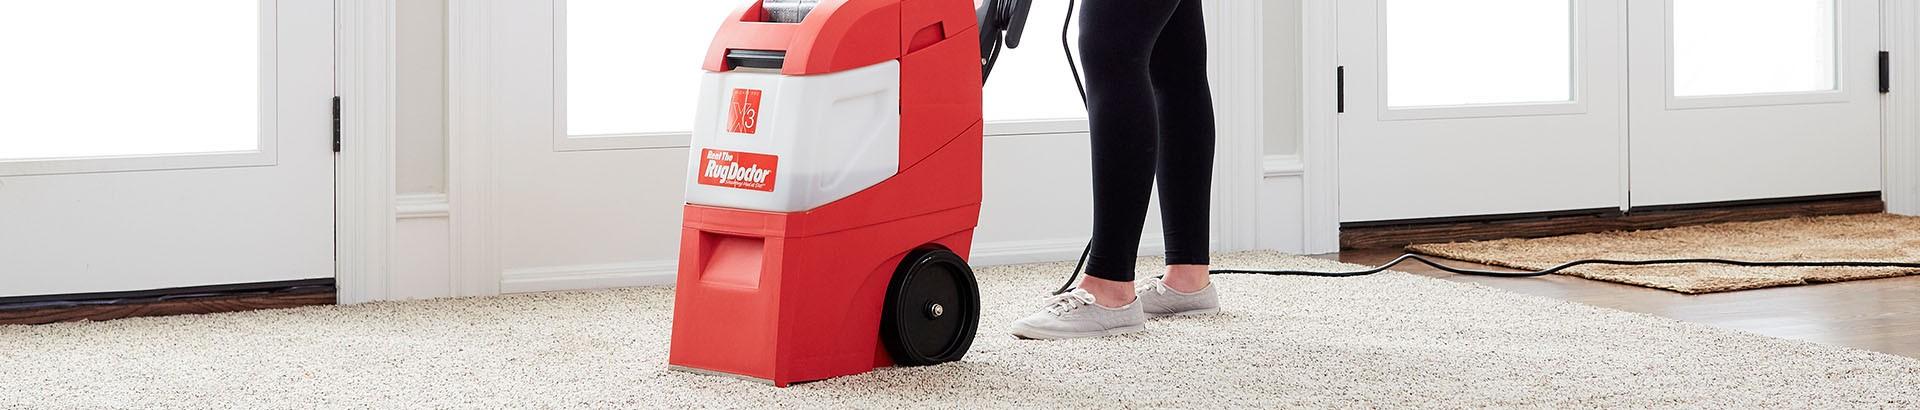 carpet cleaning machine rental walmart